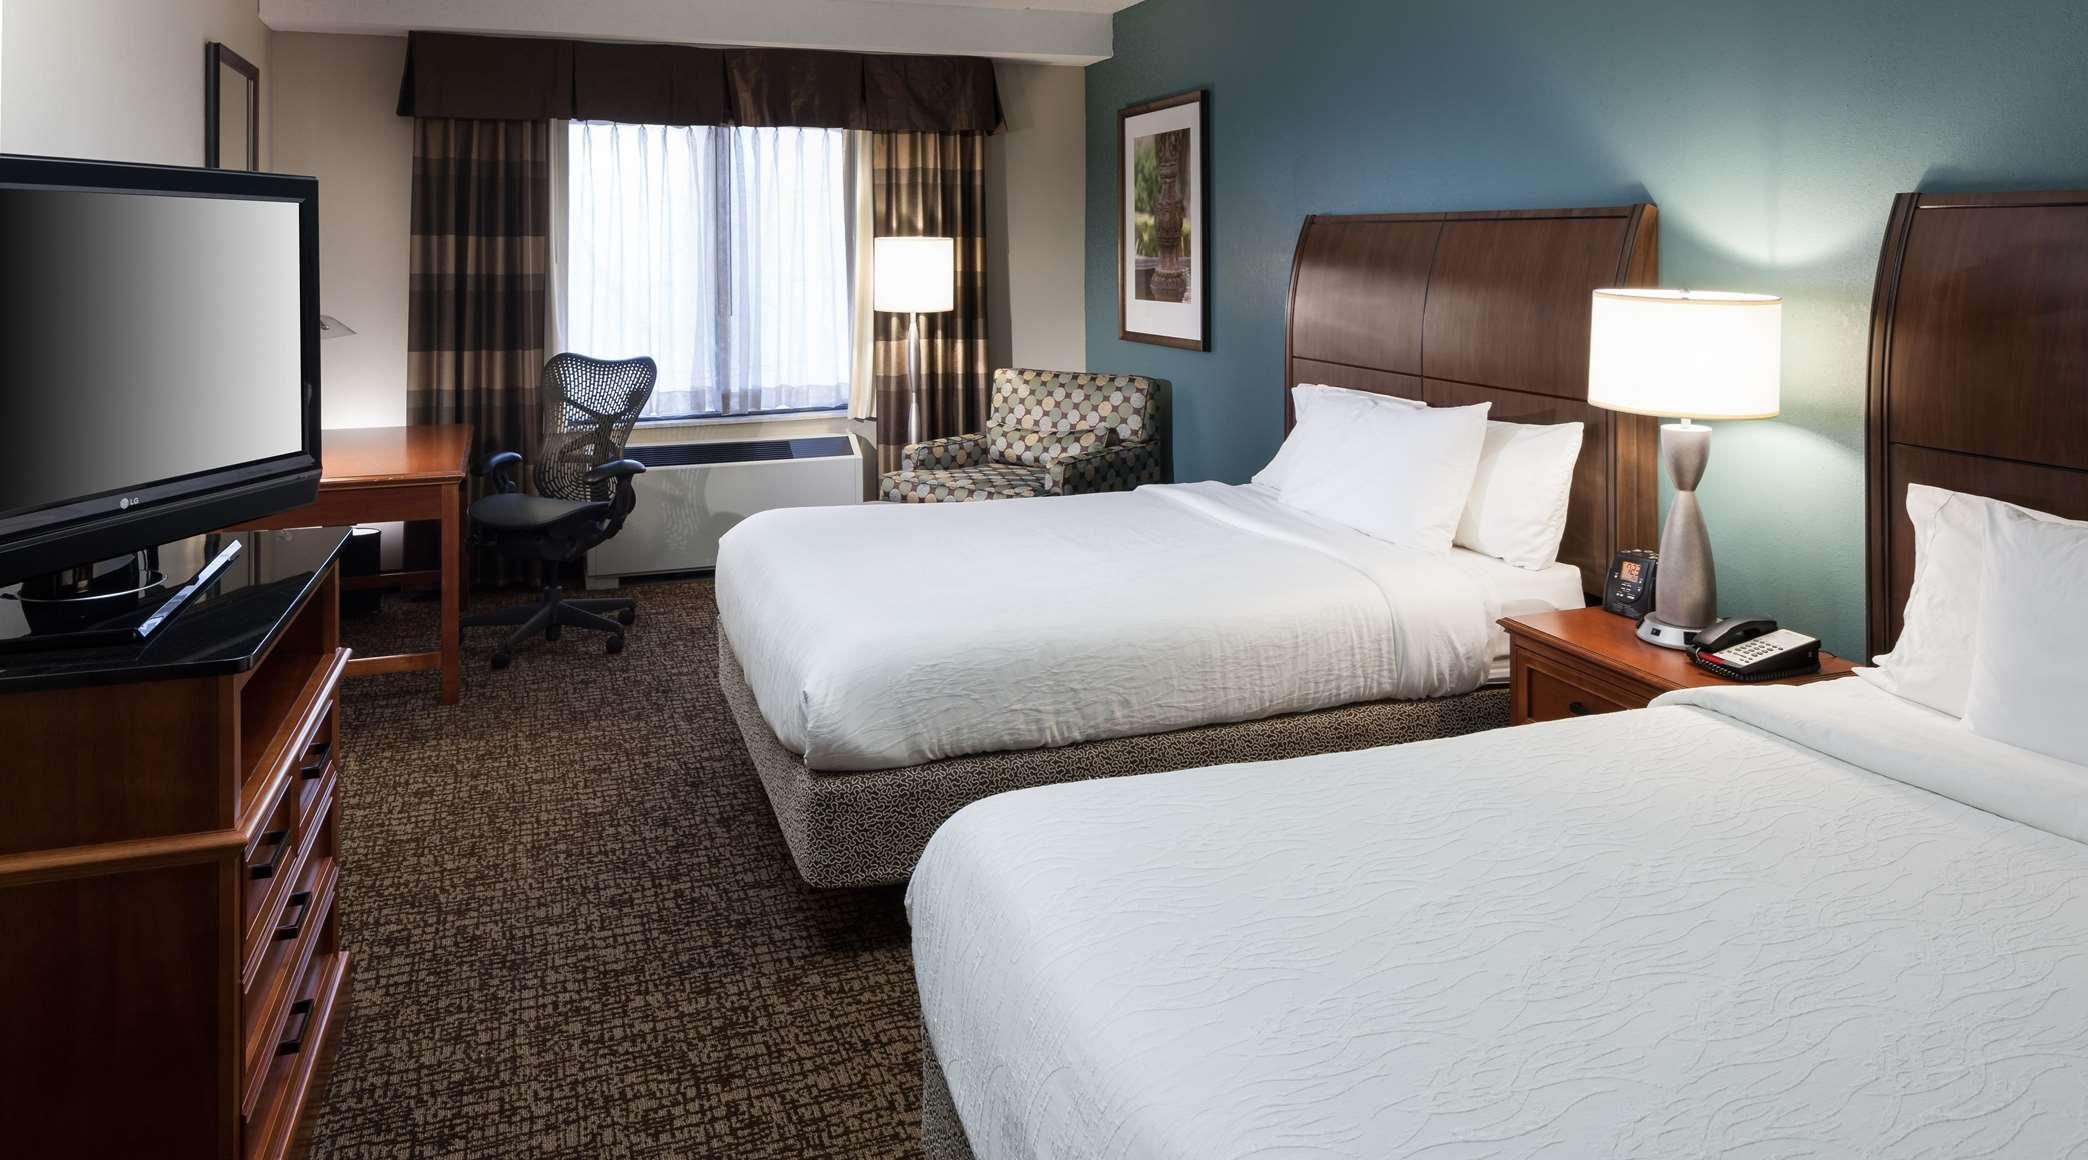 Hilton Garden Inn Rockaway image 17